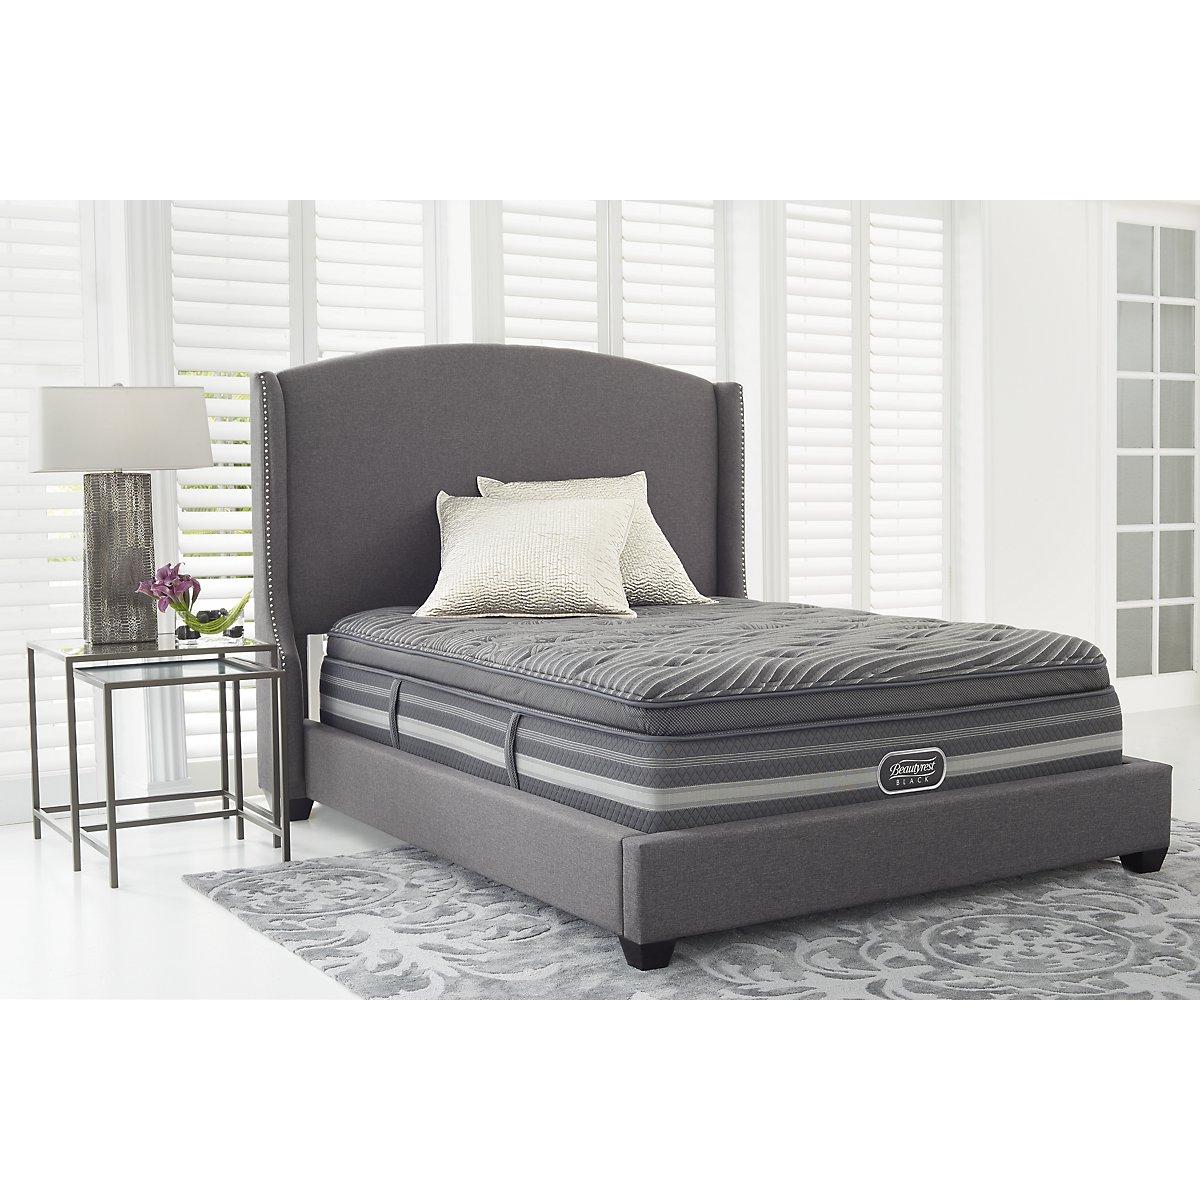 City Furniture Natasha Luxury Plush Innerspring Pillow Top Mattress